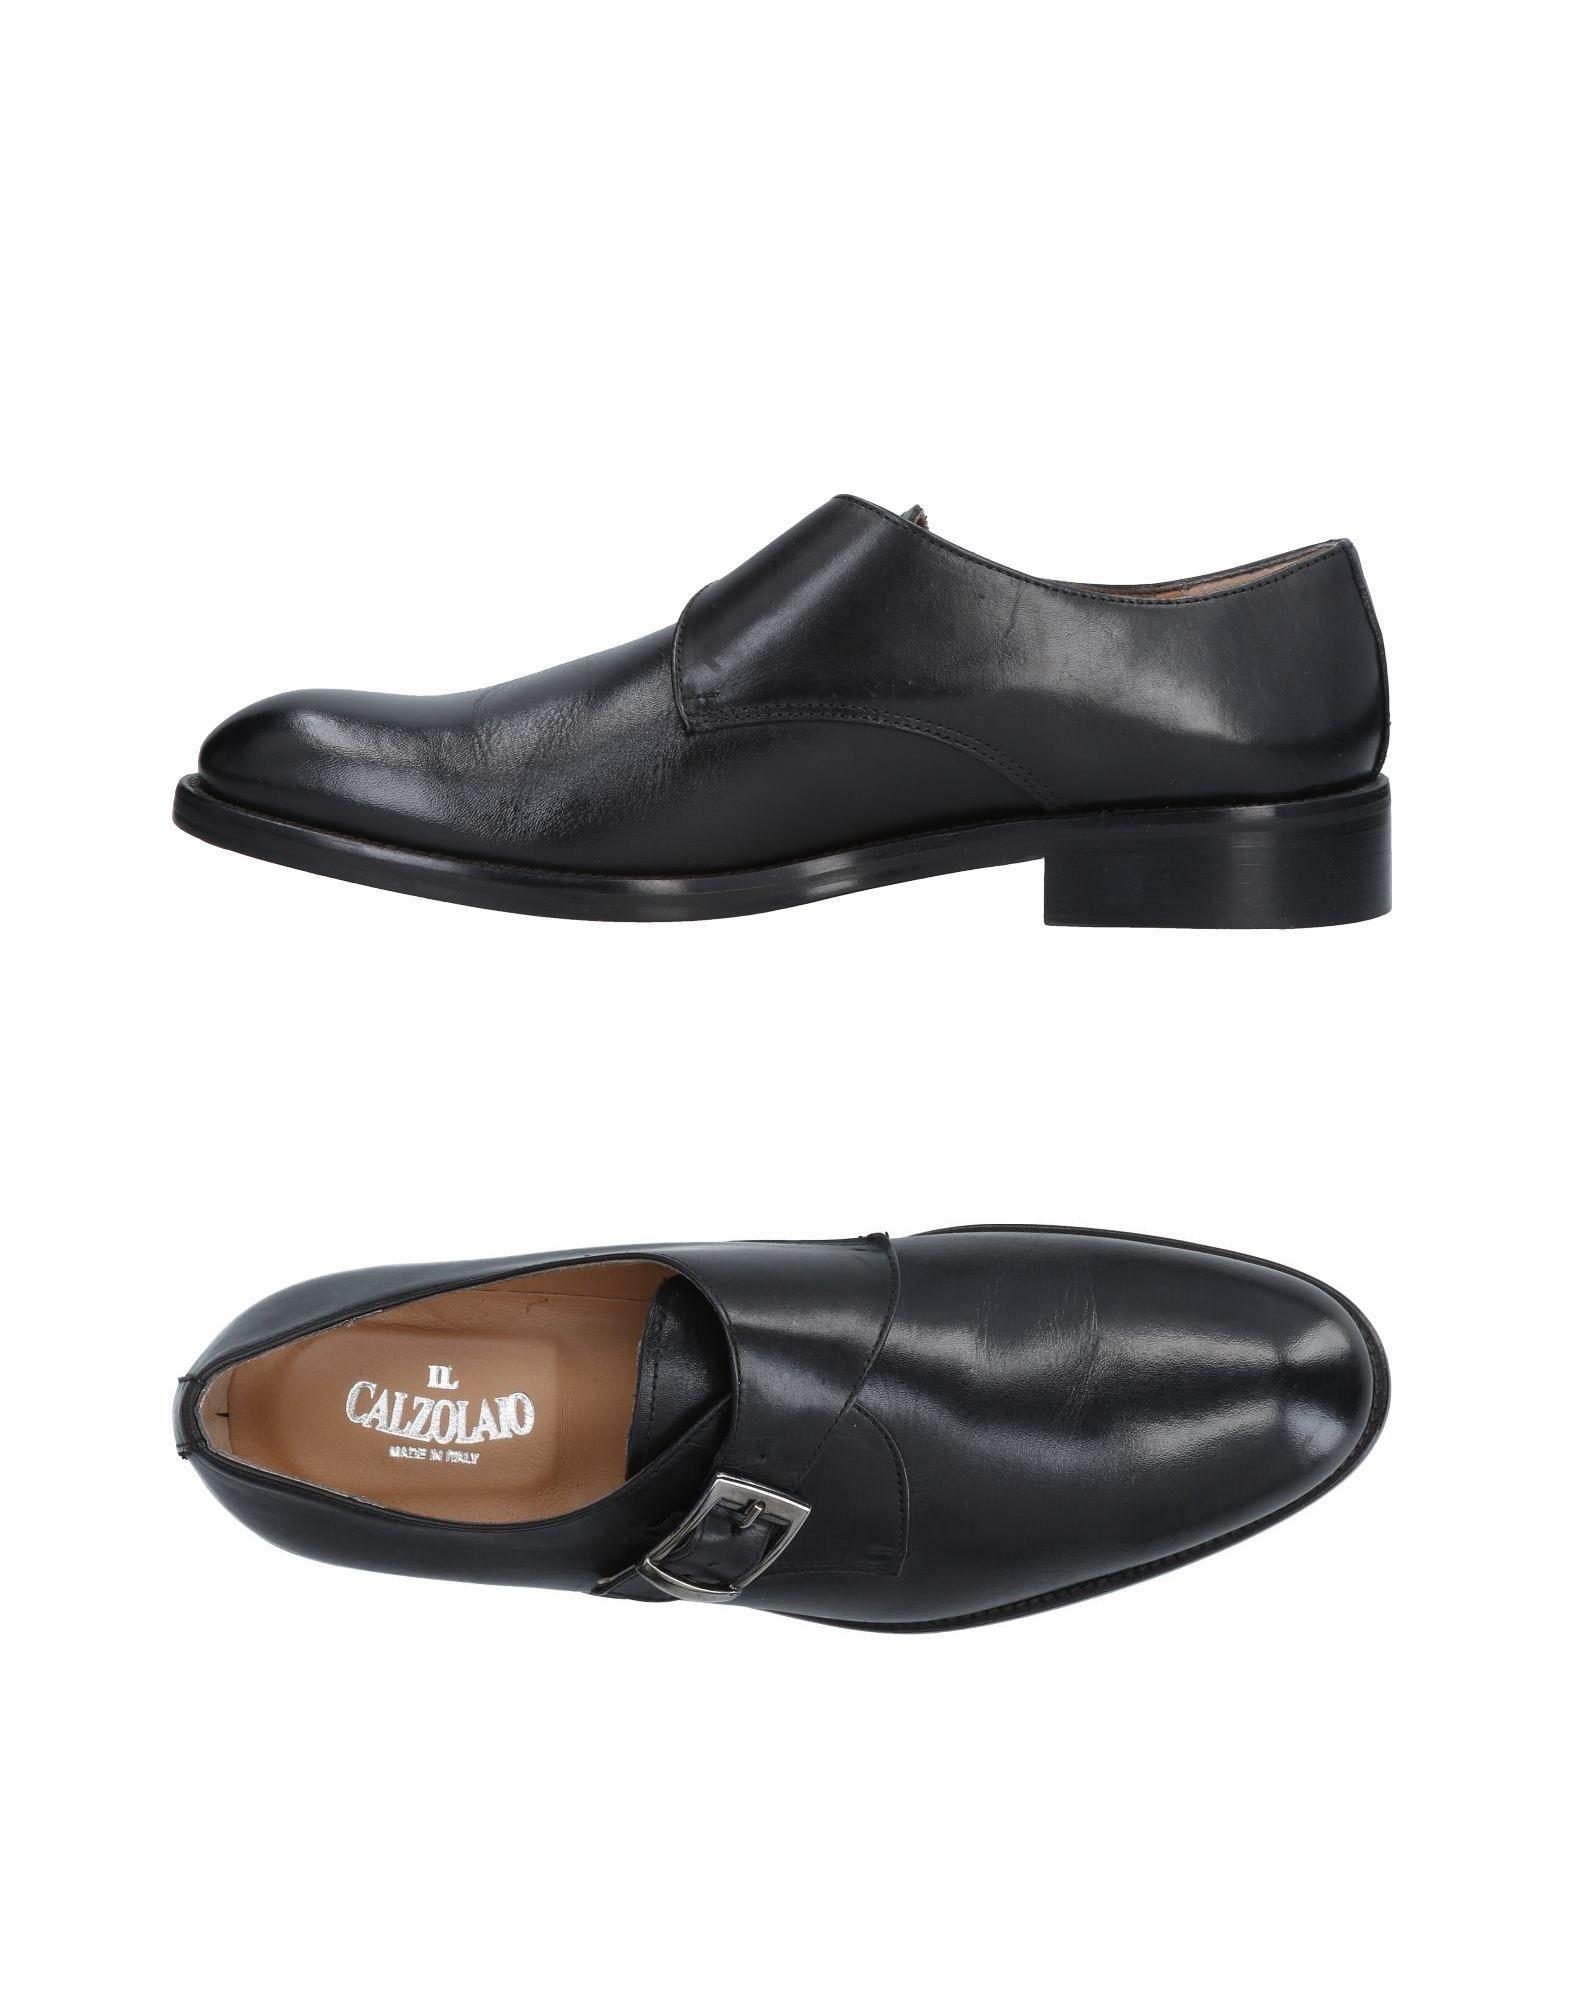 Rabatt echte Schuhe Il Calzolaio 11475439BB Mokassins Herren  11475439BB Calzolaio 9f5da7